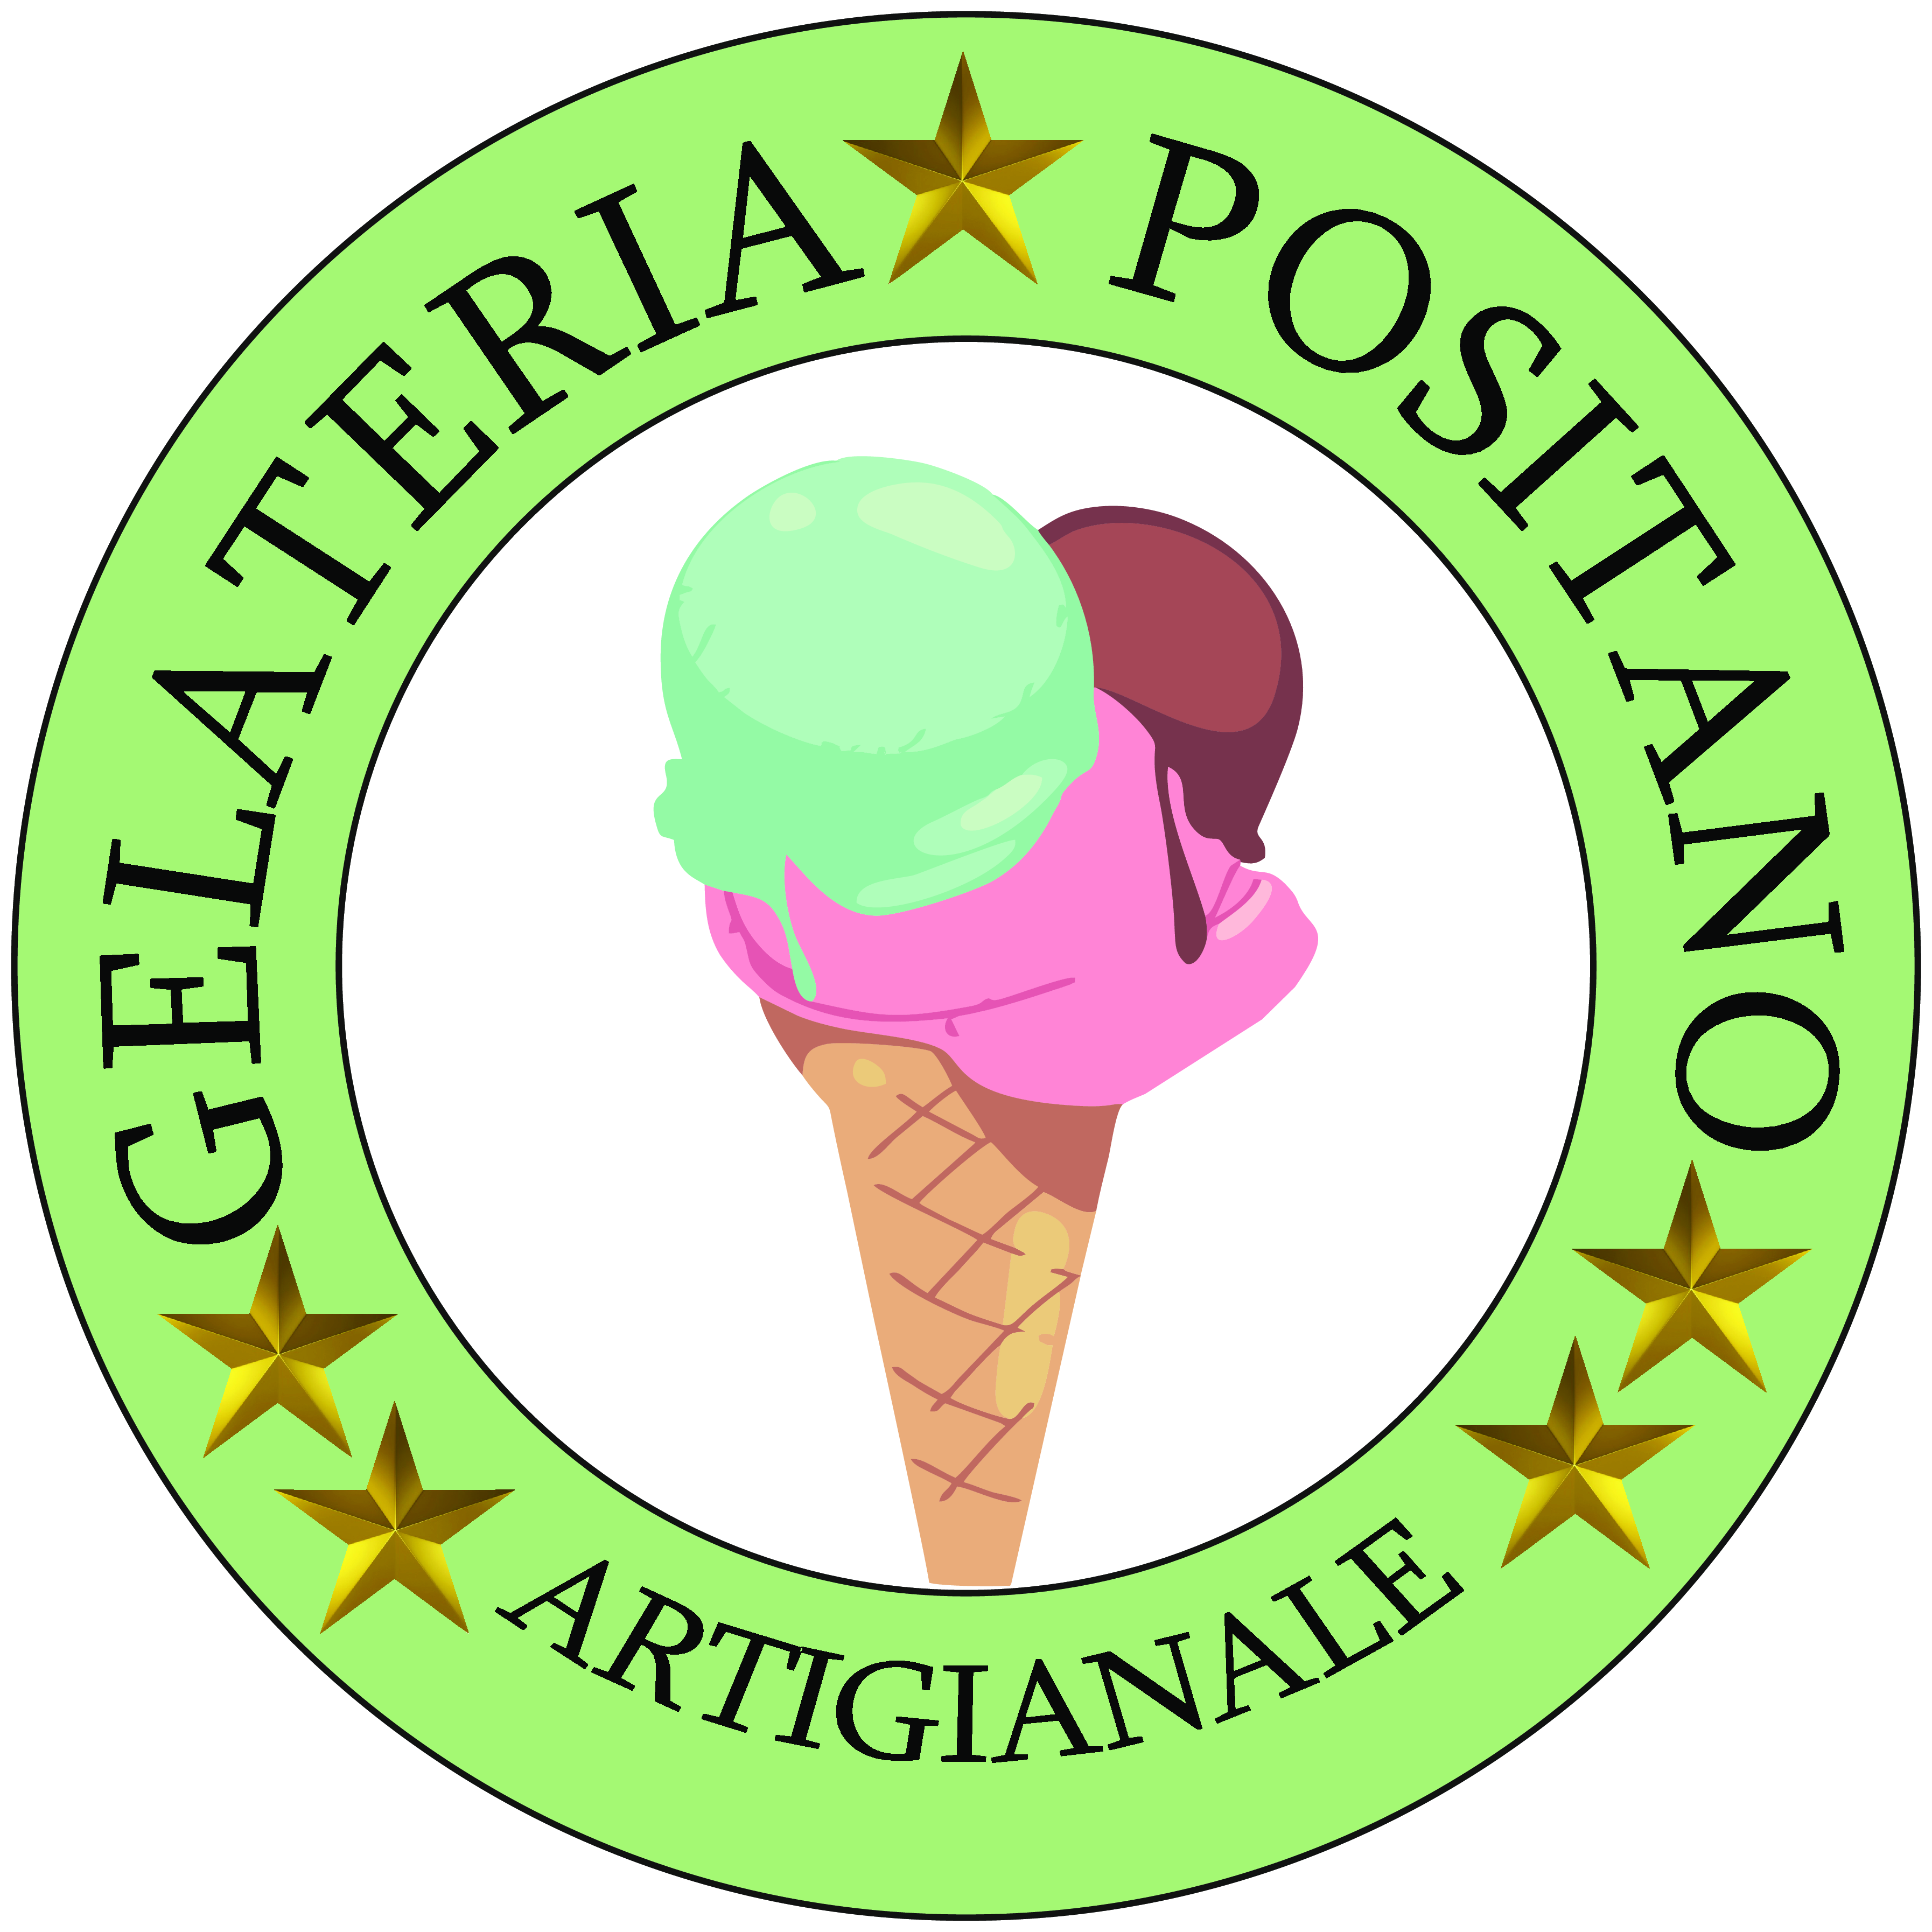 Gelateria-positano-frolunda-torg